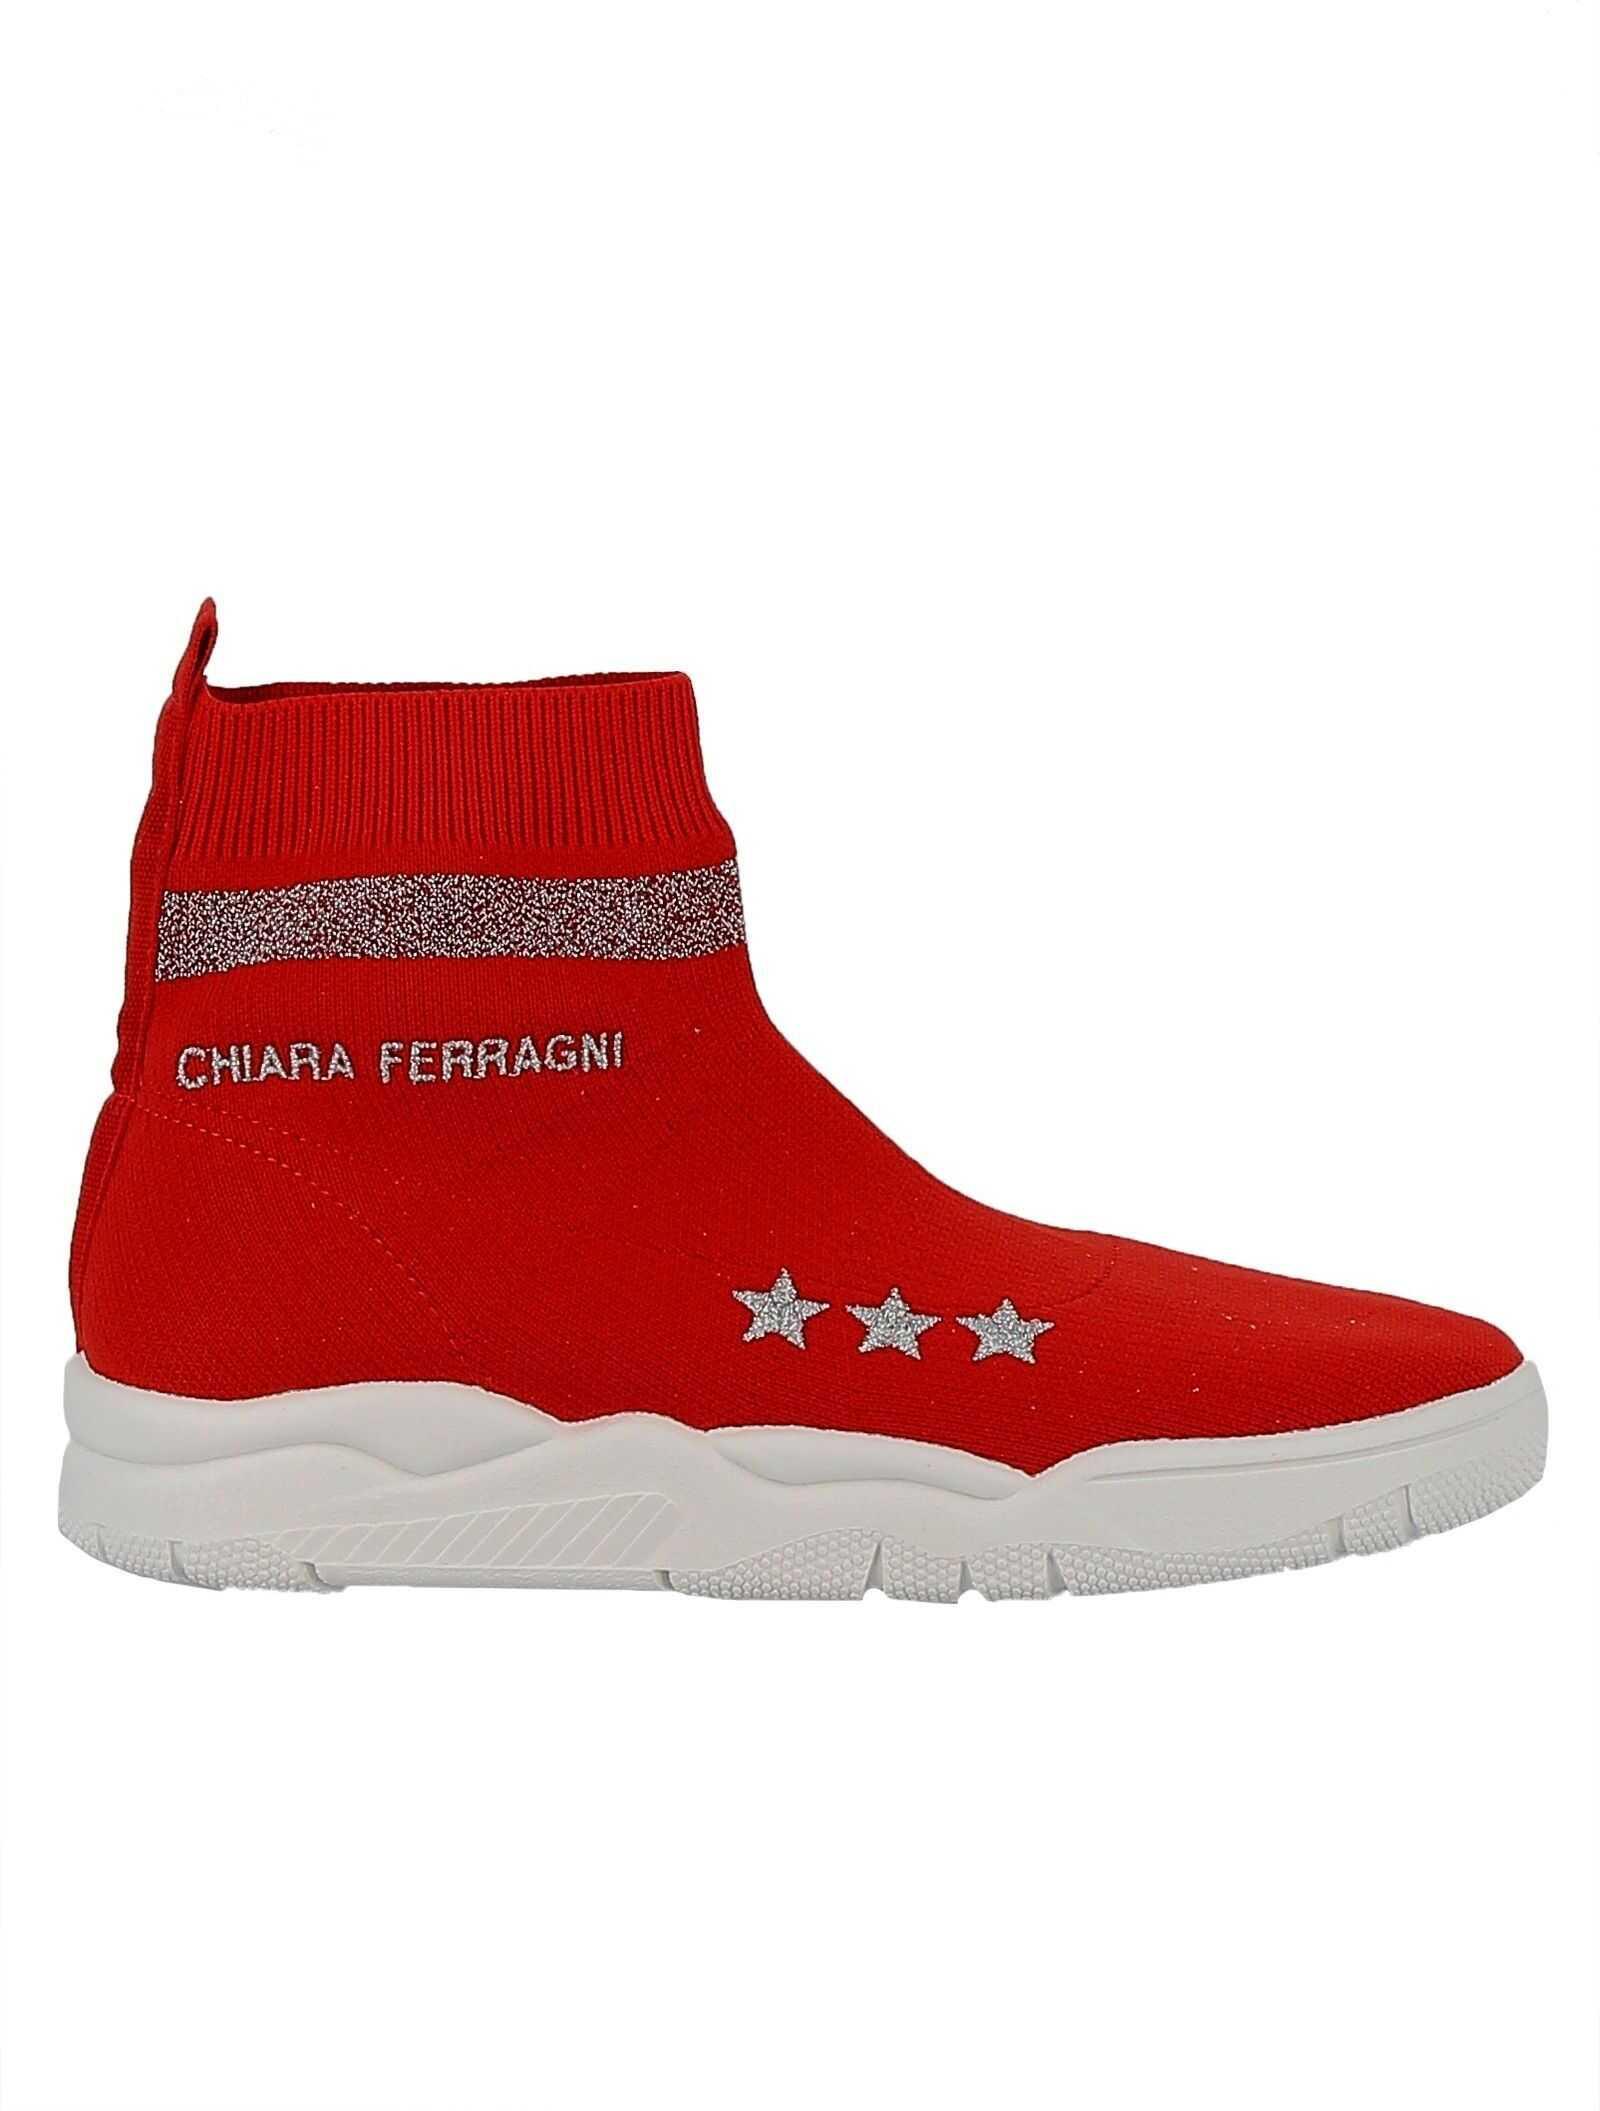 Chiara Ferragni Fabric Ankle Boots RED